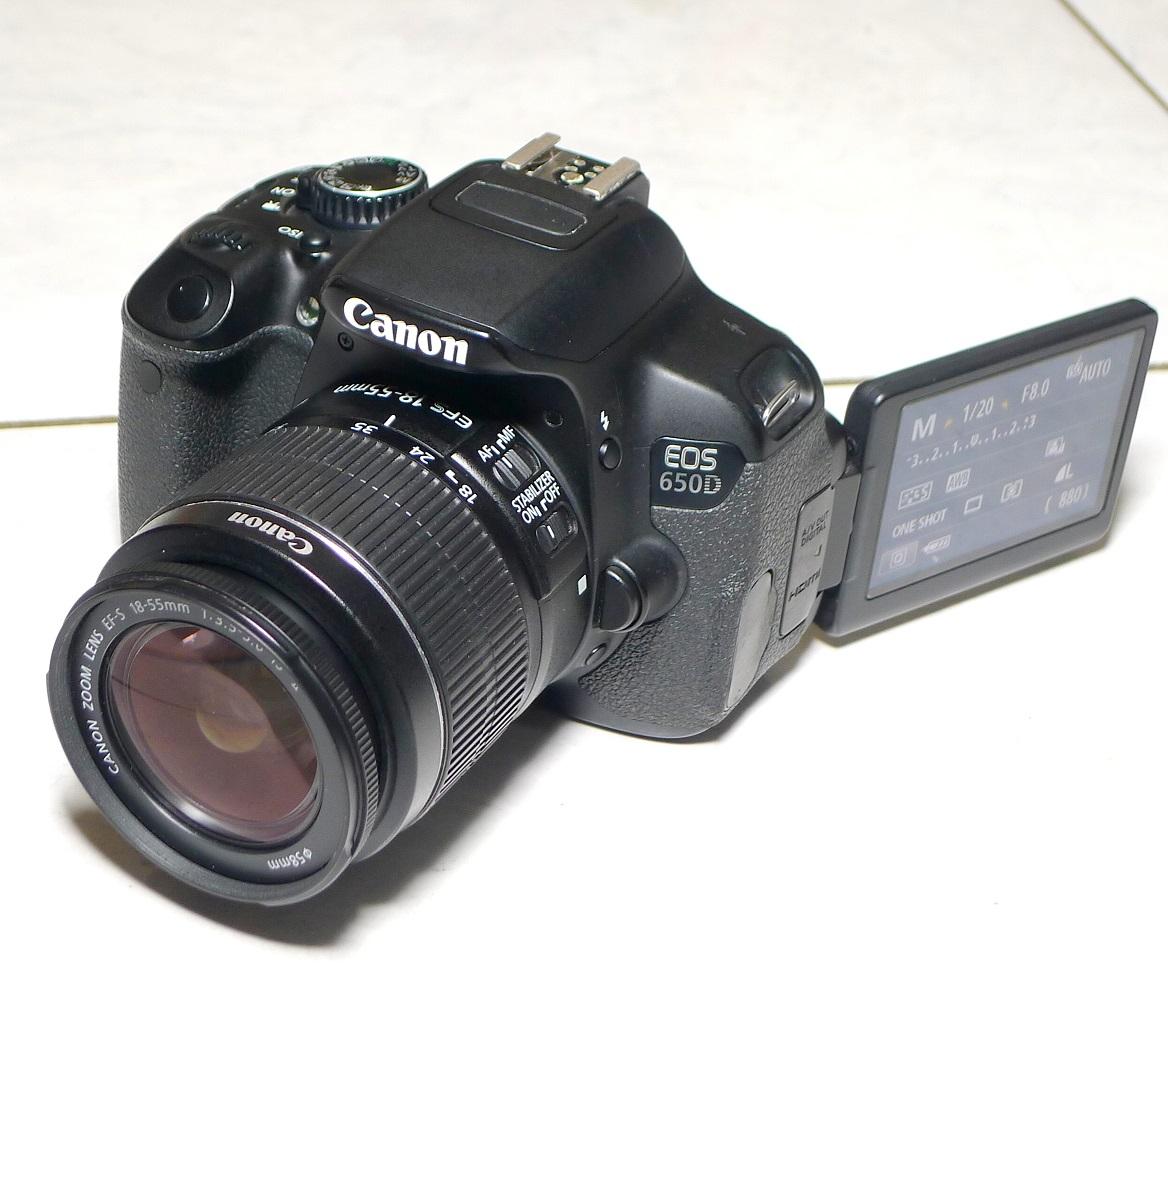 Jual Kamera Canon Eos 650D Bekas